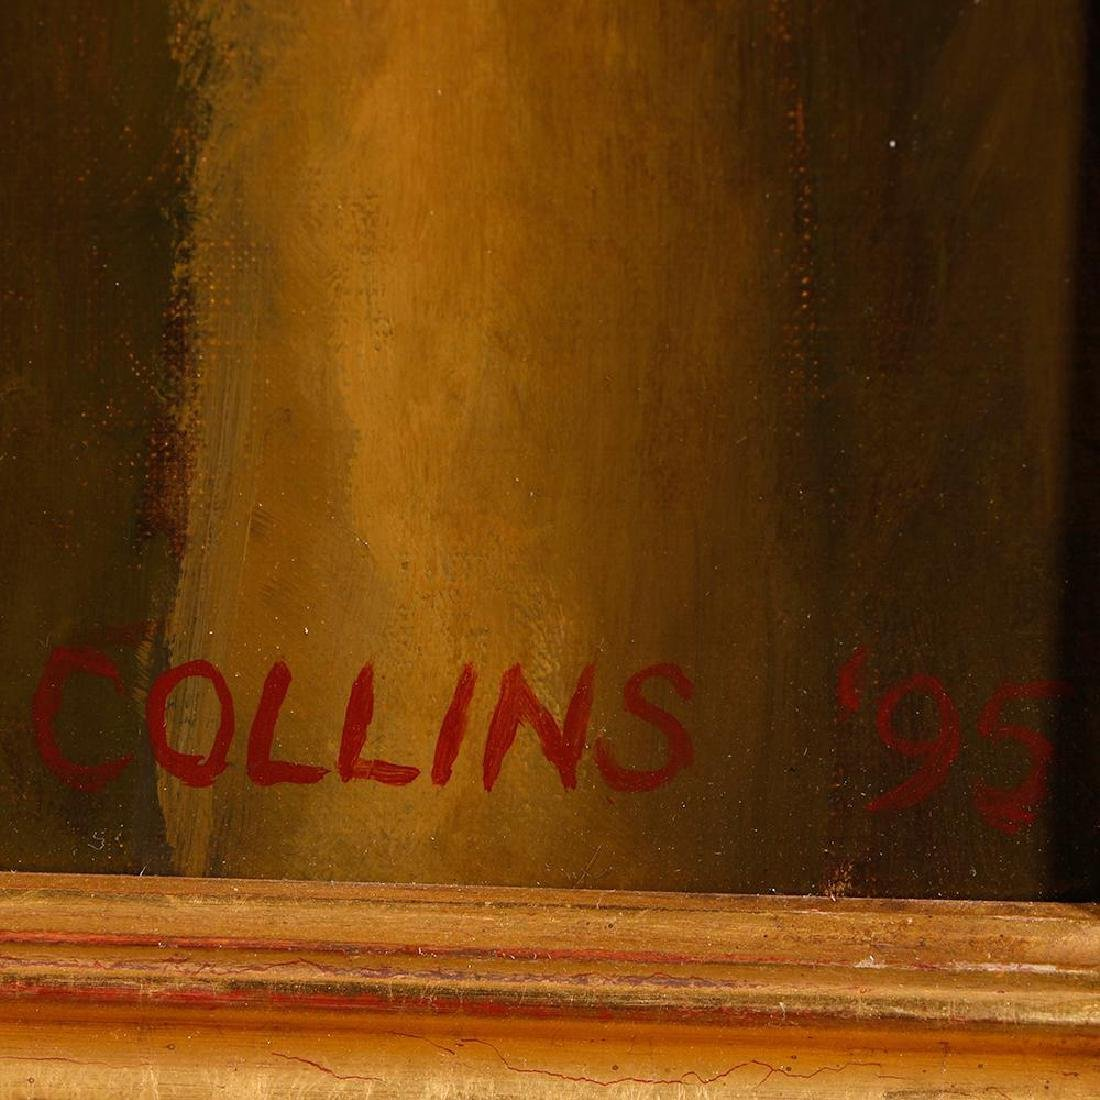 Jacob Collins (born 1964) - 4